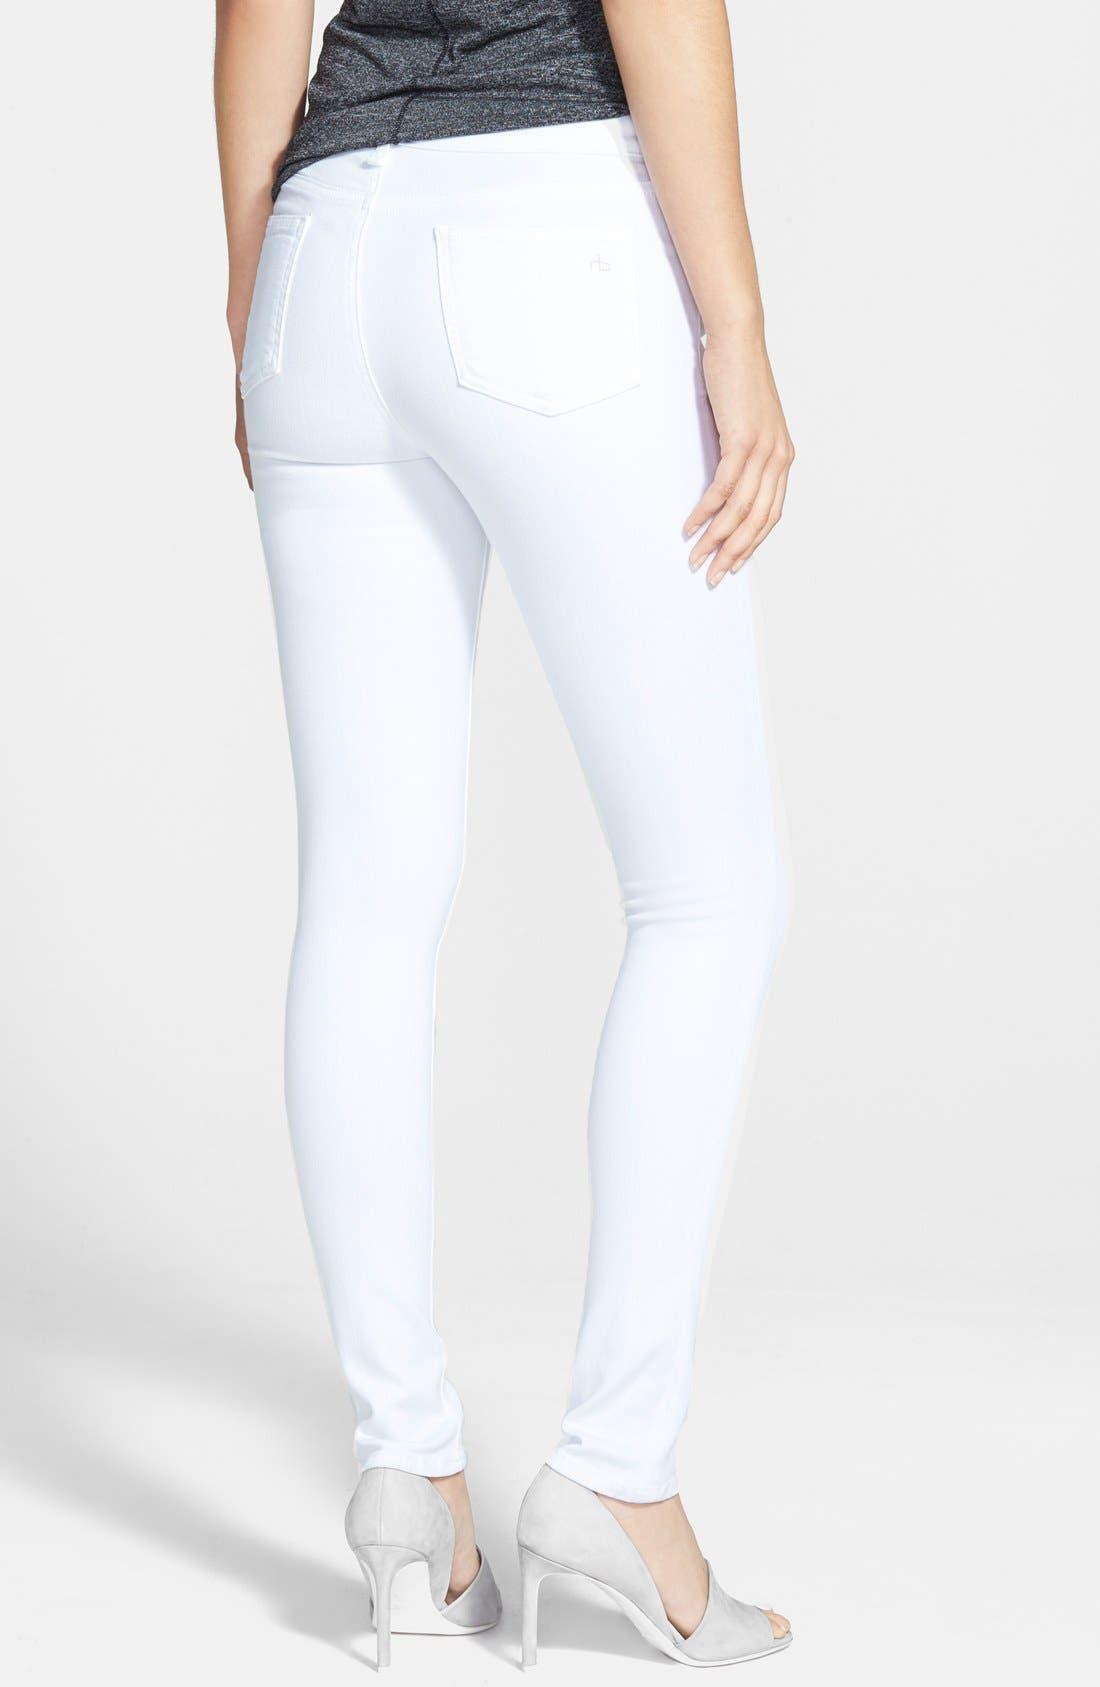 'The Skinny' Jeans,                             Alternate thumbnail 2, color,                             Bright White